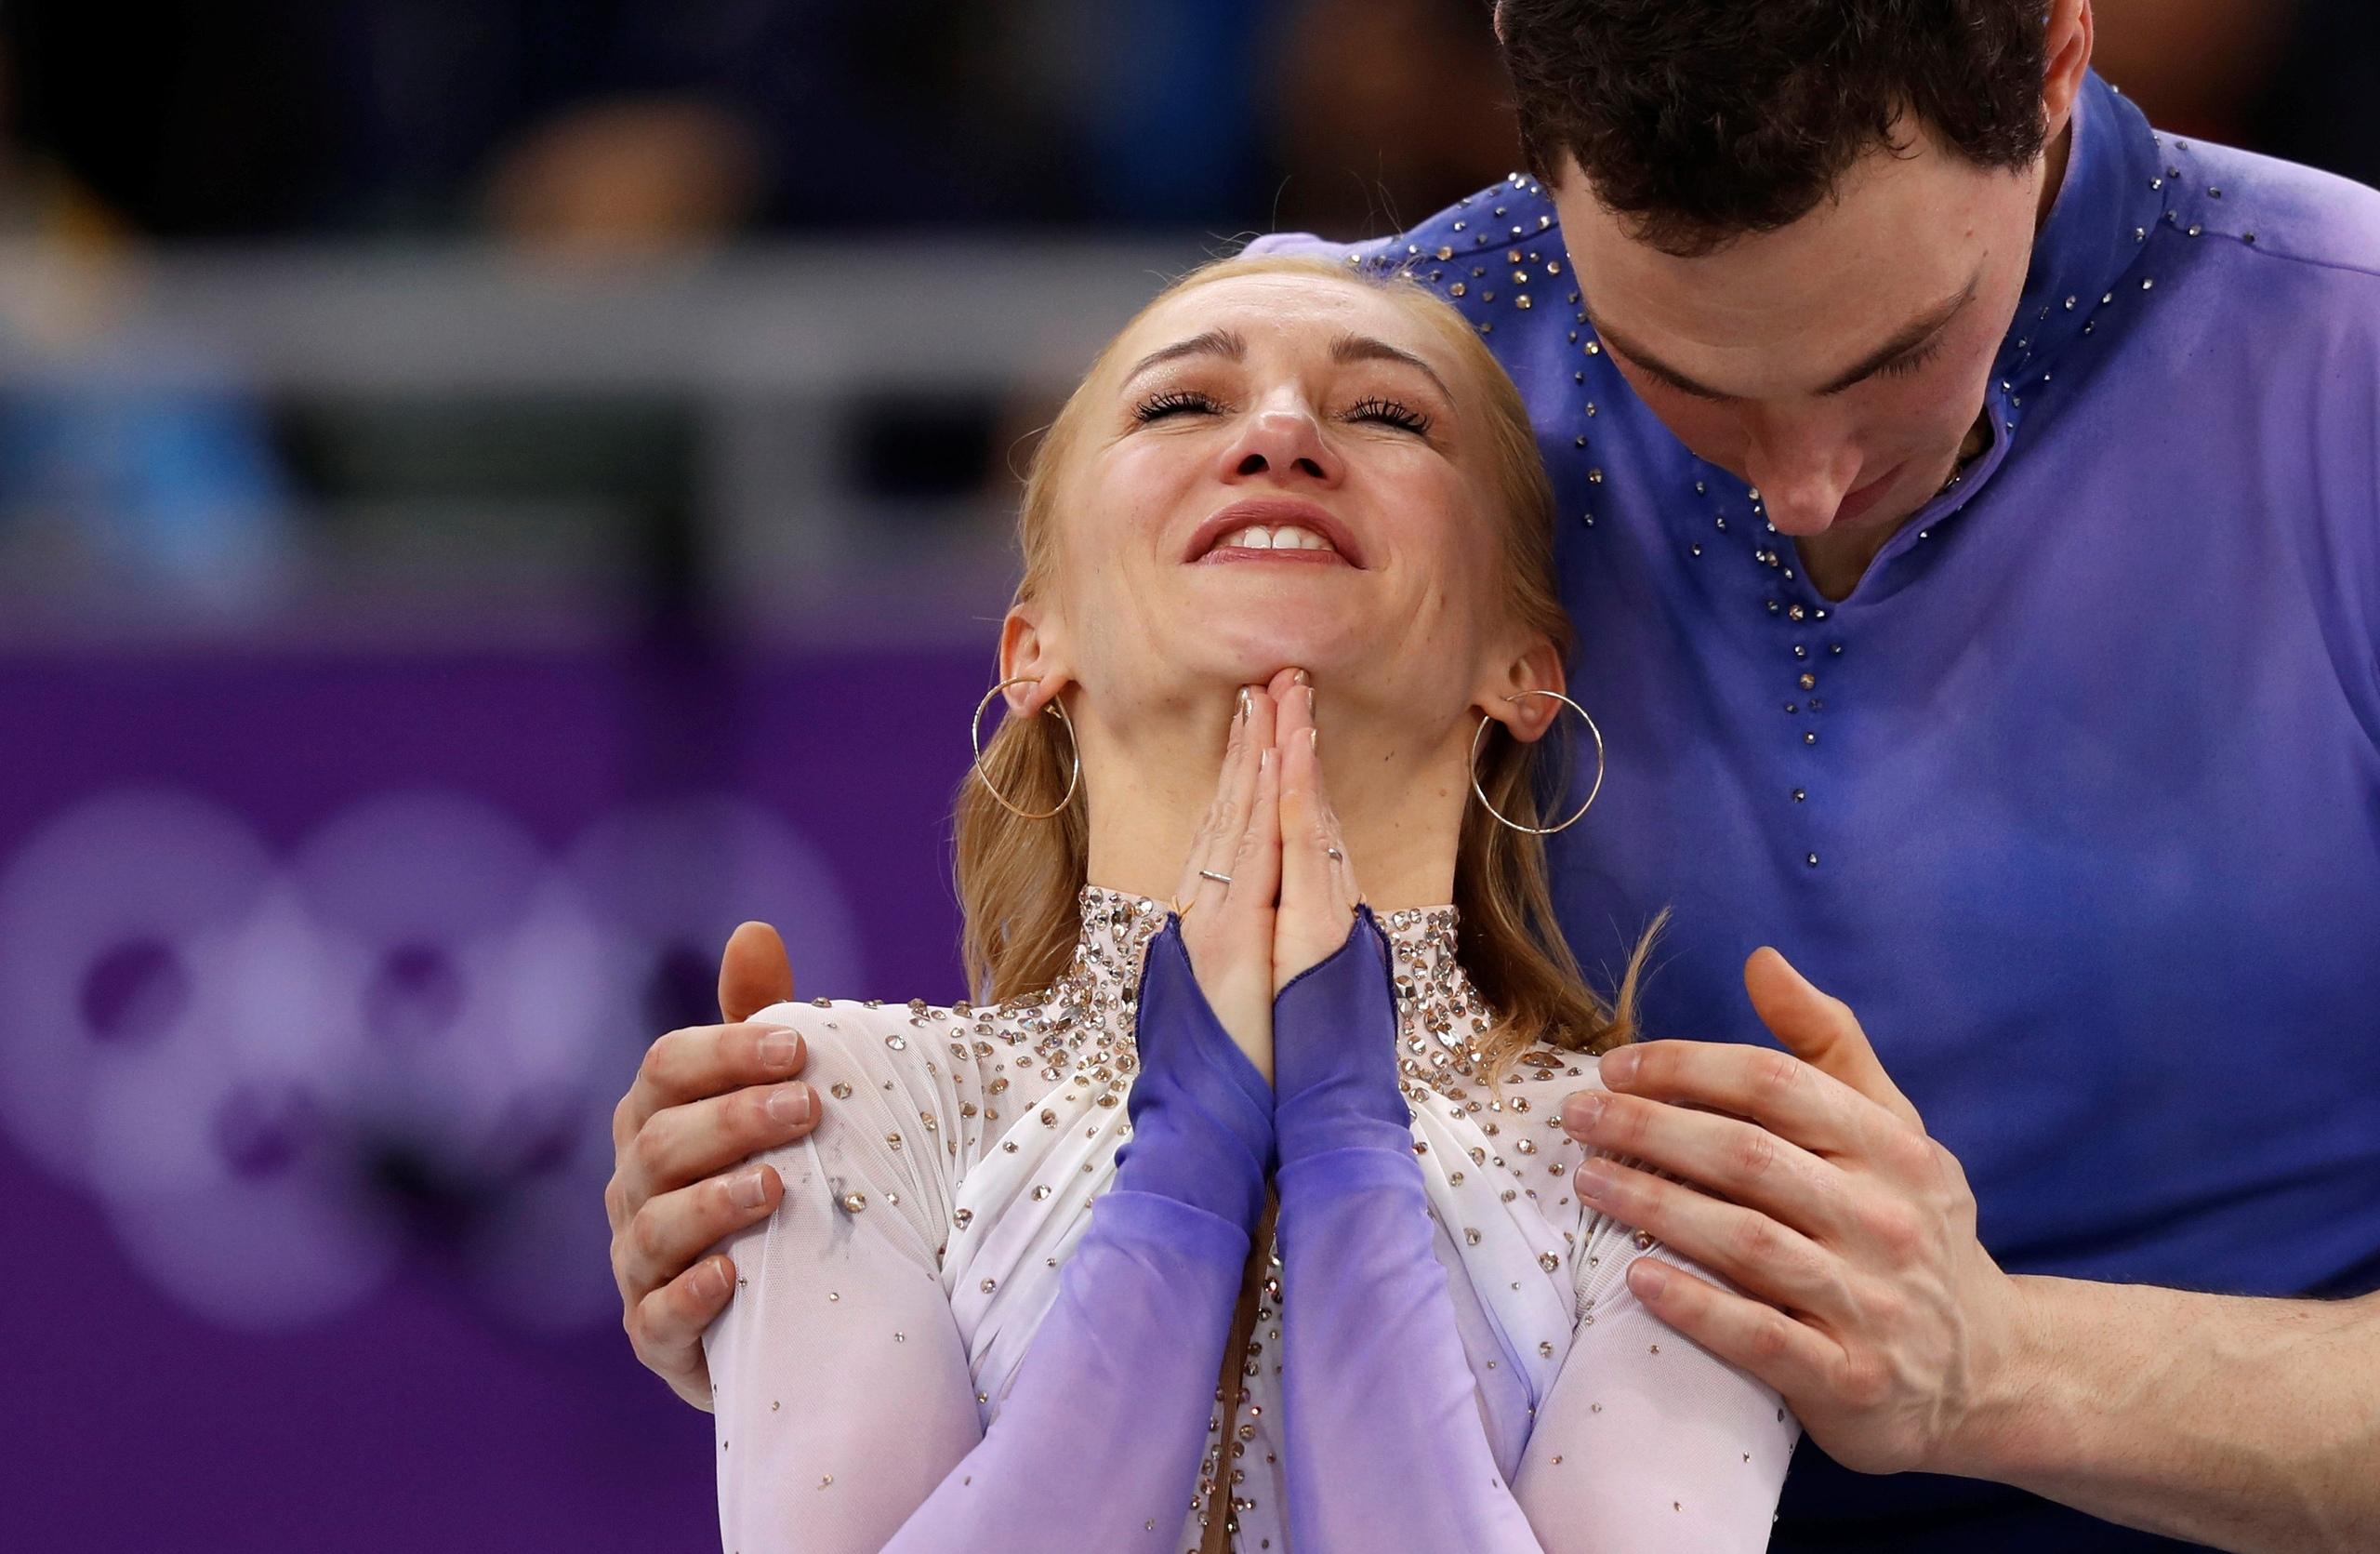 Алена Савченко - Бруно Массо / Aliona SAVCHENKO - Bruno MASSOT GER - Страница 25 W16TA5F2fGI